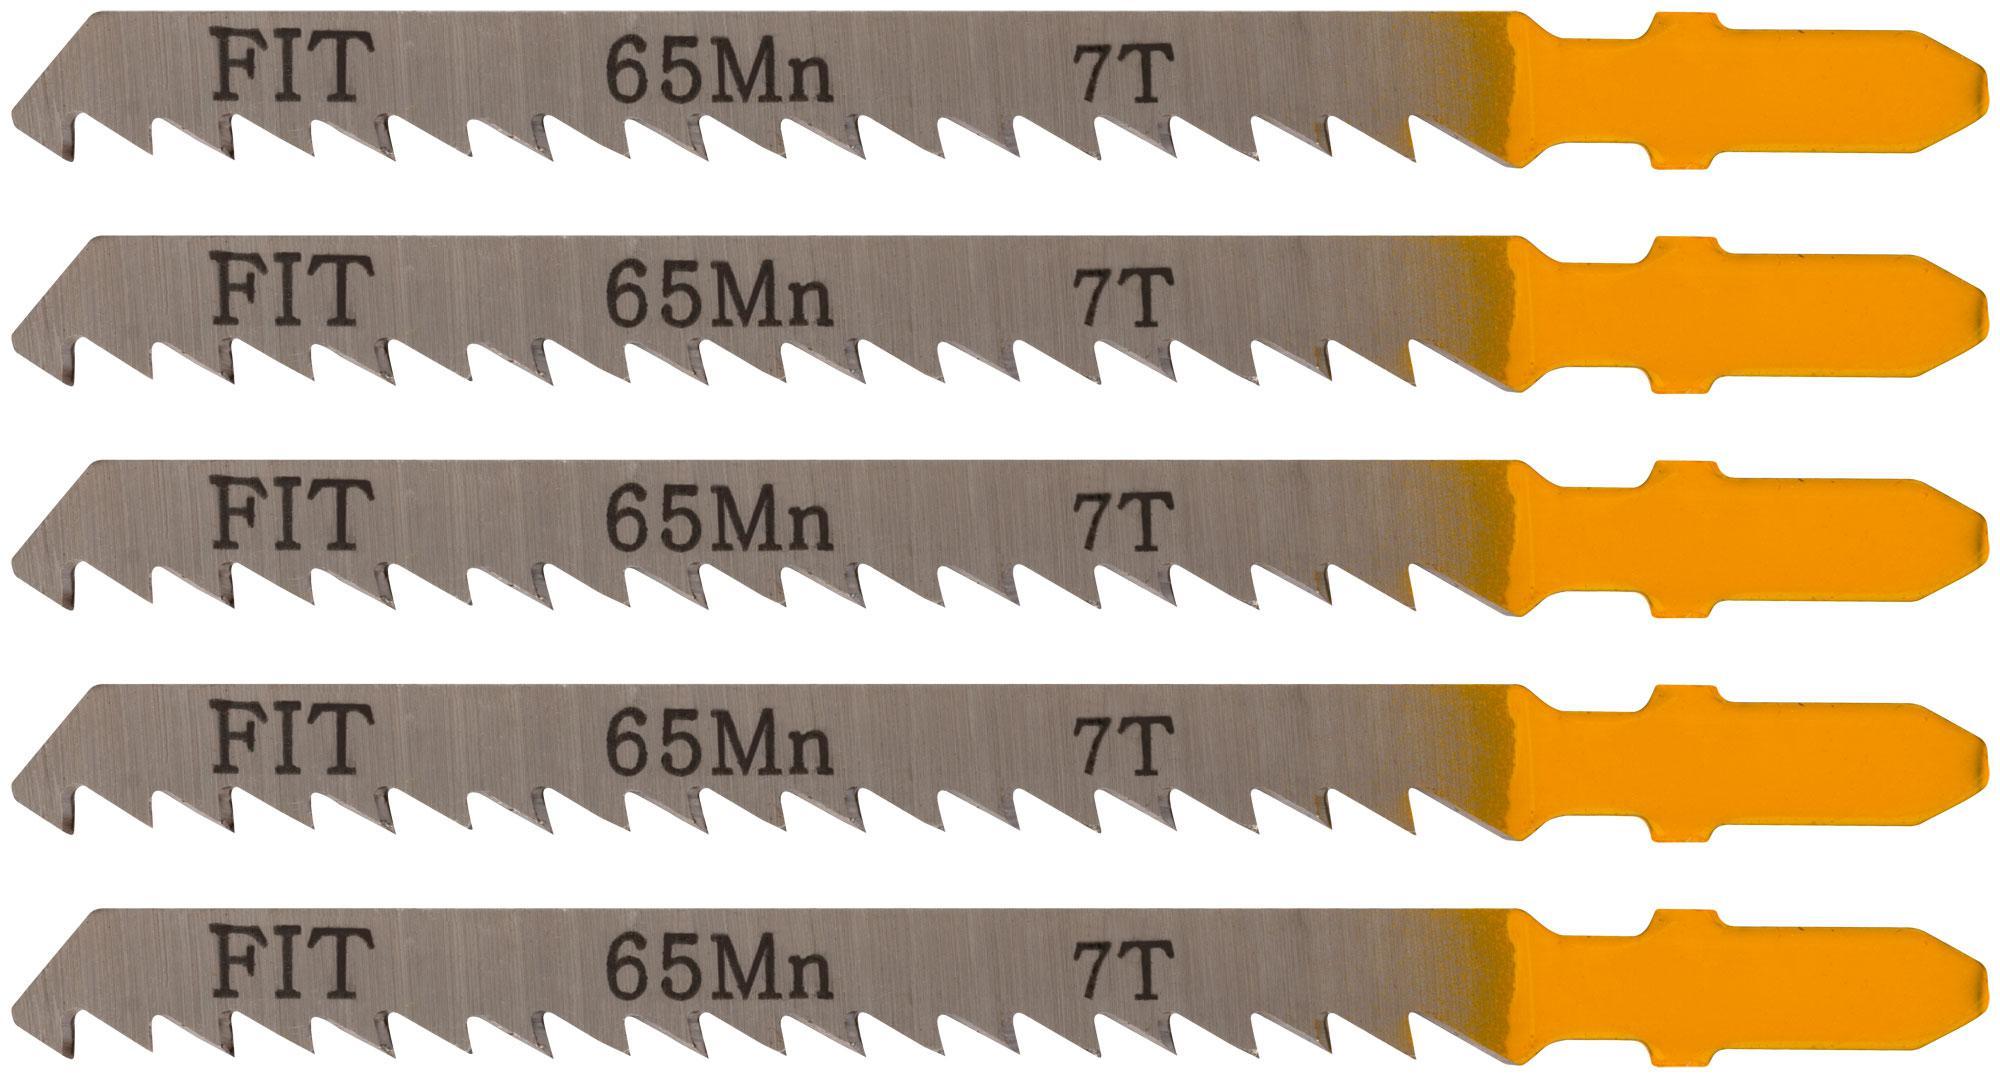 Пилки для лобзика Fit 41108 пилки для лобзика по дереву набор 5 шт стандарт